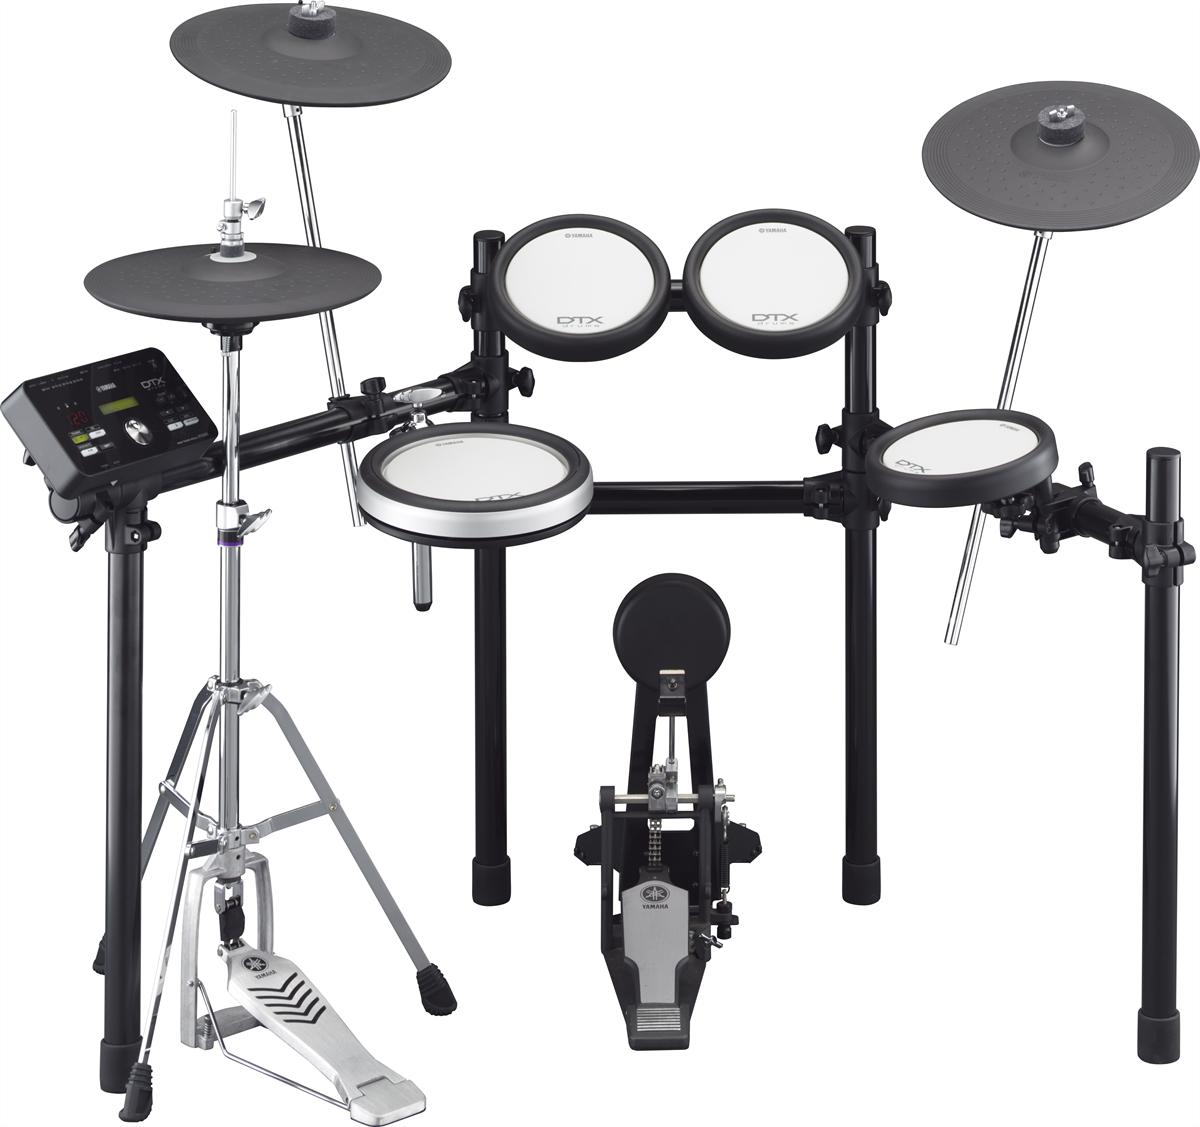 DTX562K Yamaha Complete E-Drum Set